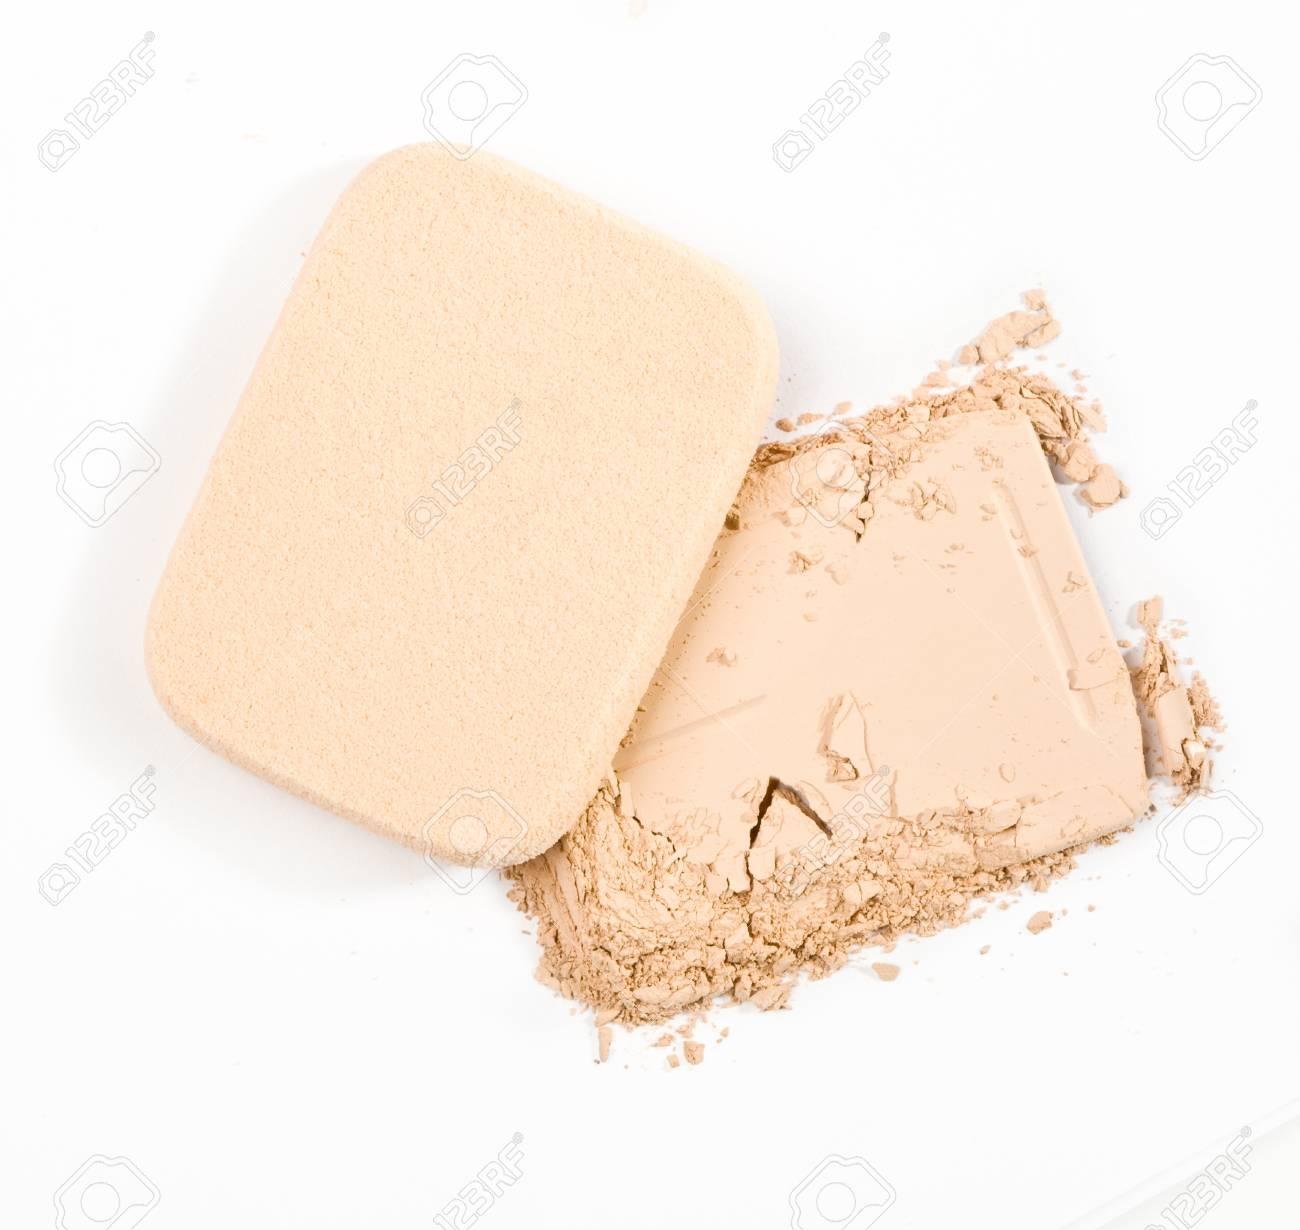 make-up powder on white background Stock Photo - 19128506